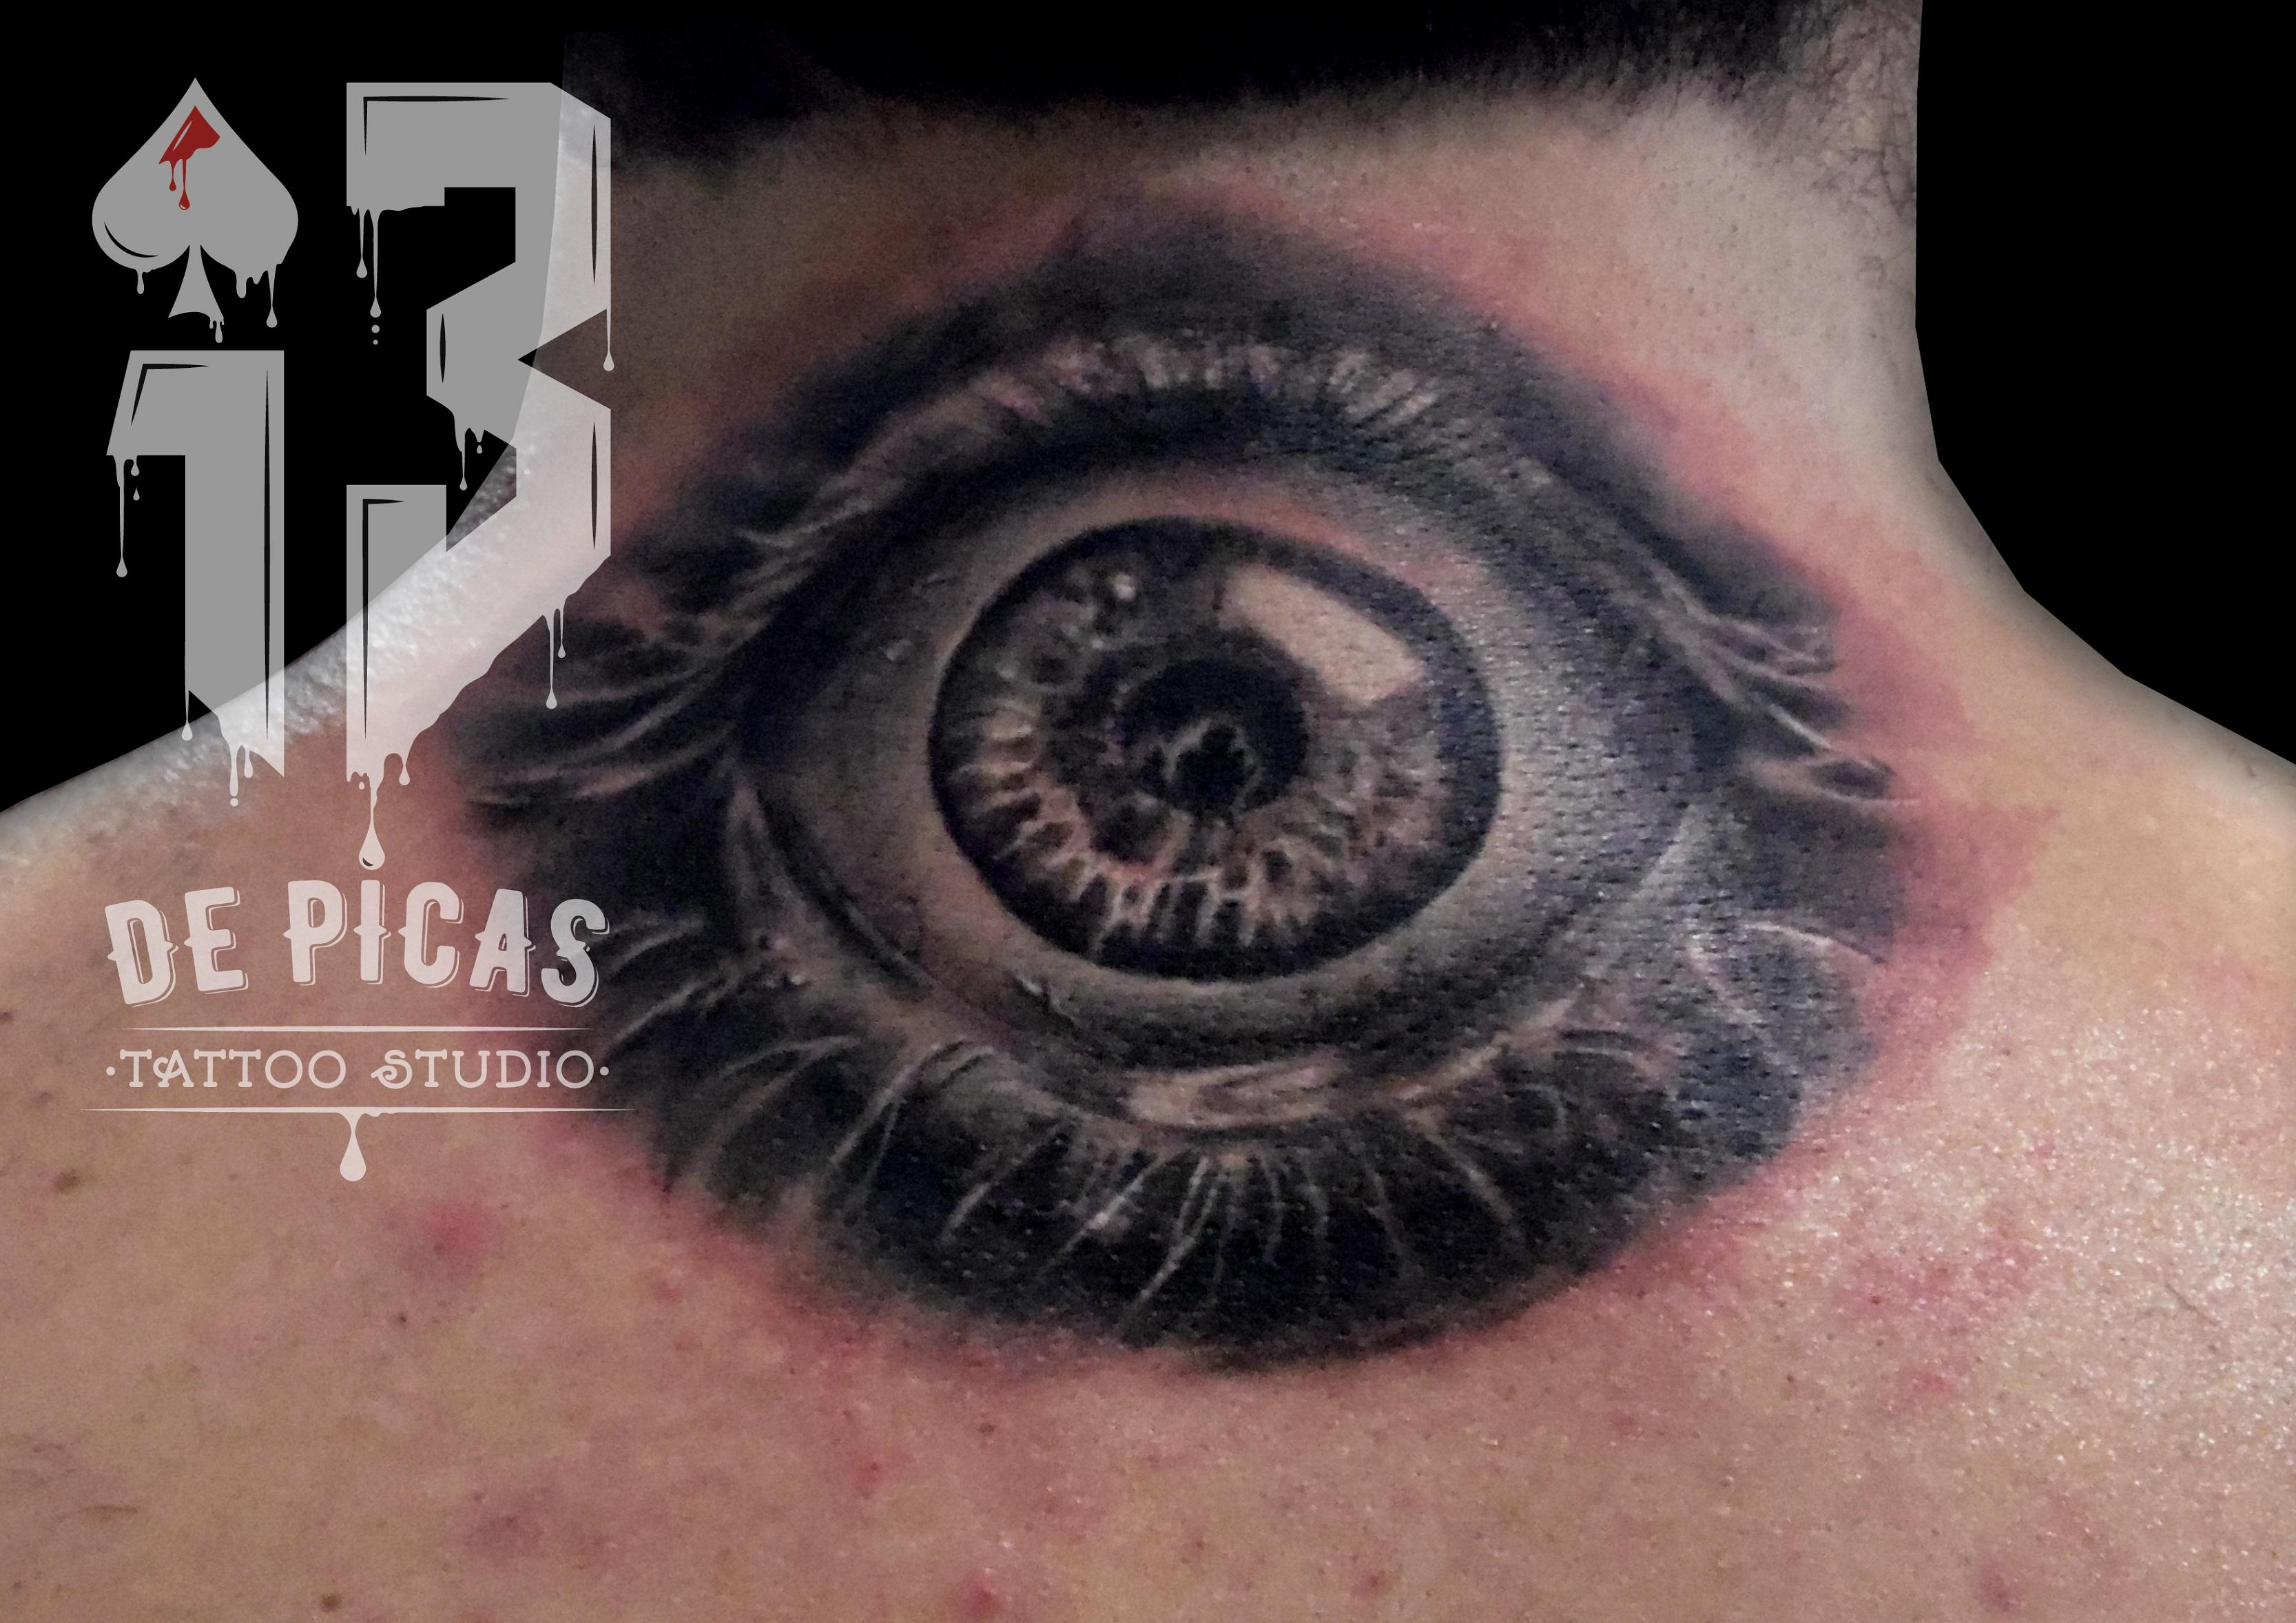 tatuaje tattoo ojo realista espalda nuca black grey 13depicas jaca huesca